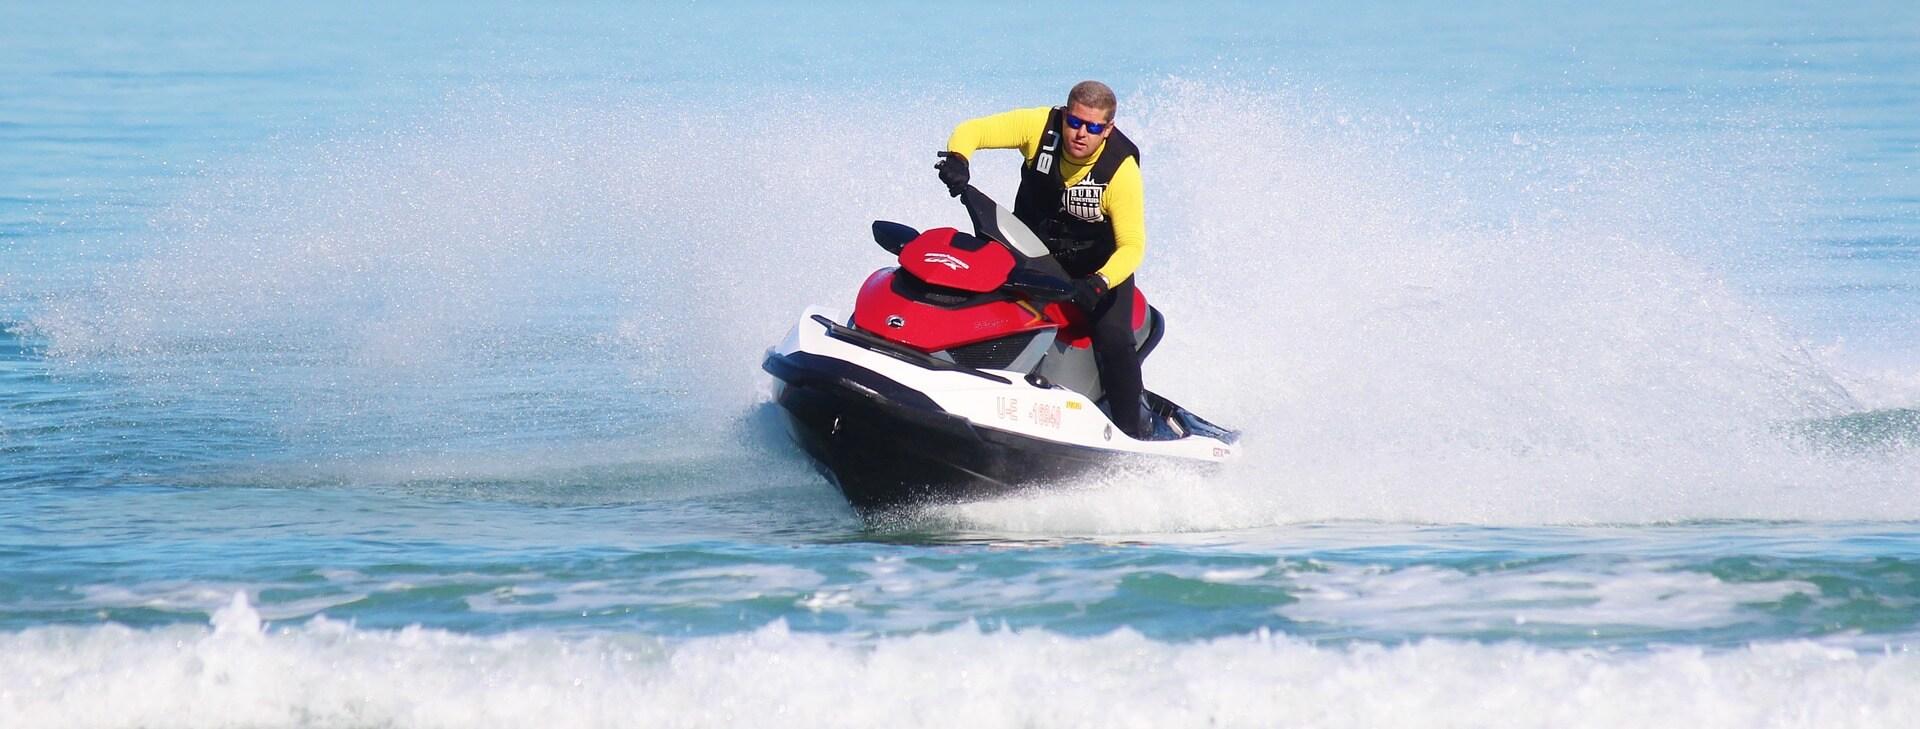 ¿Es necesario disponer de algún carné para pilotar motos de agua?